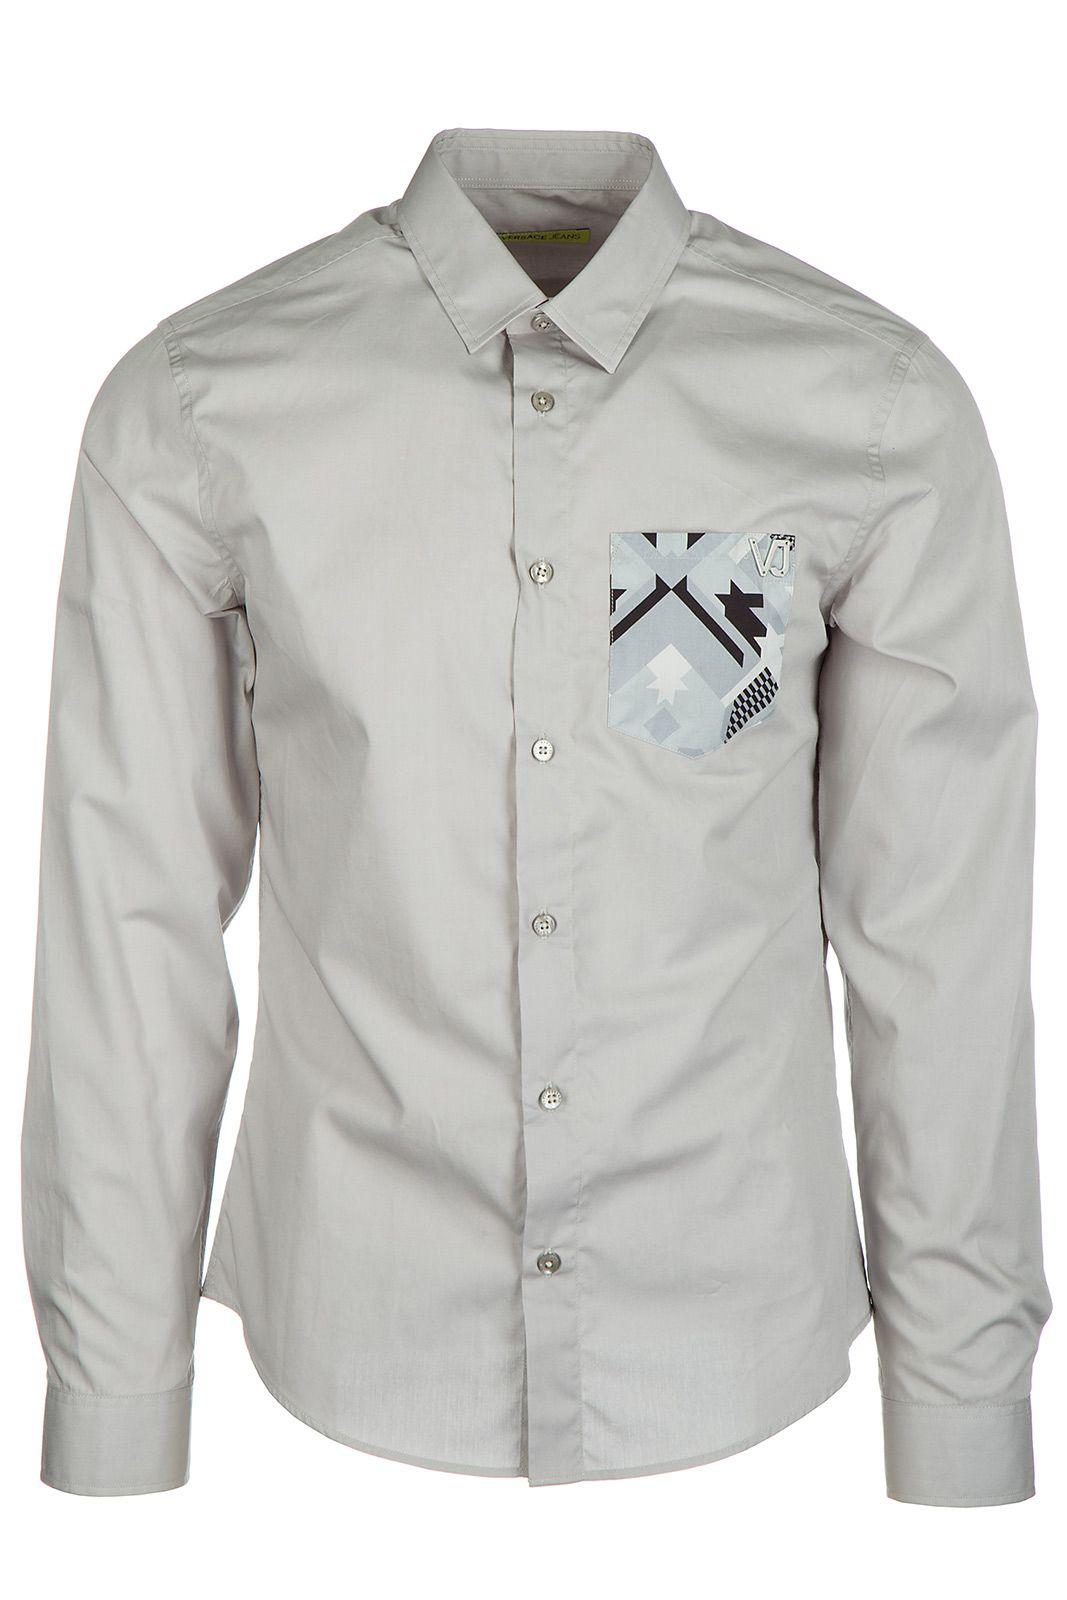 Menus long sleeve shirt dress shirt grey versace jeans men